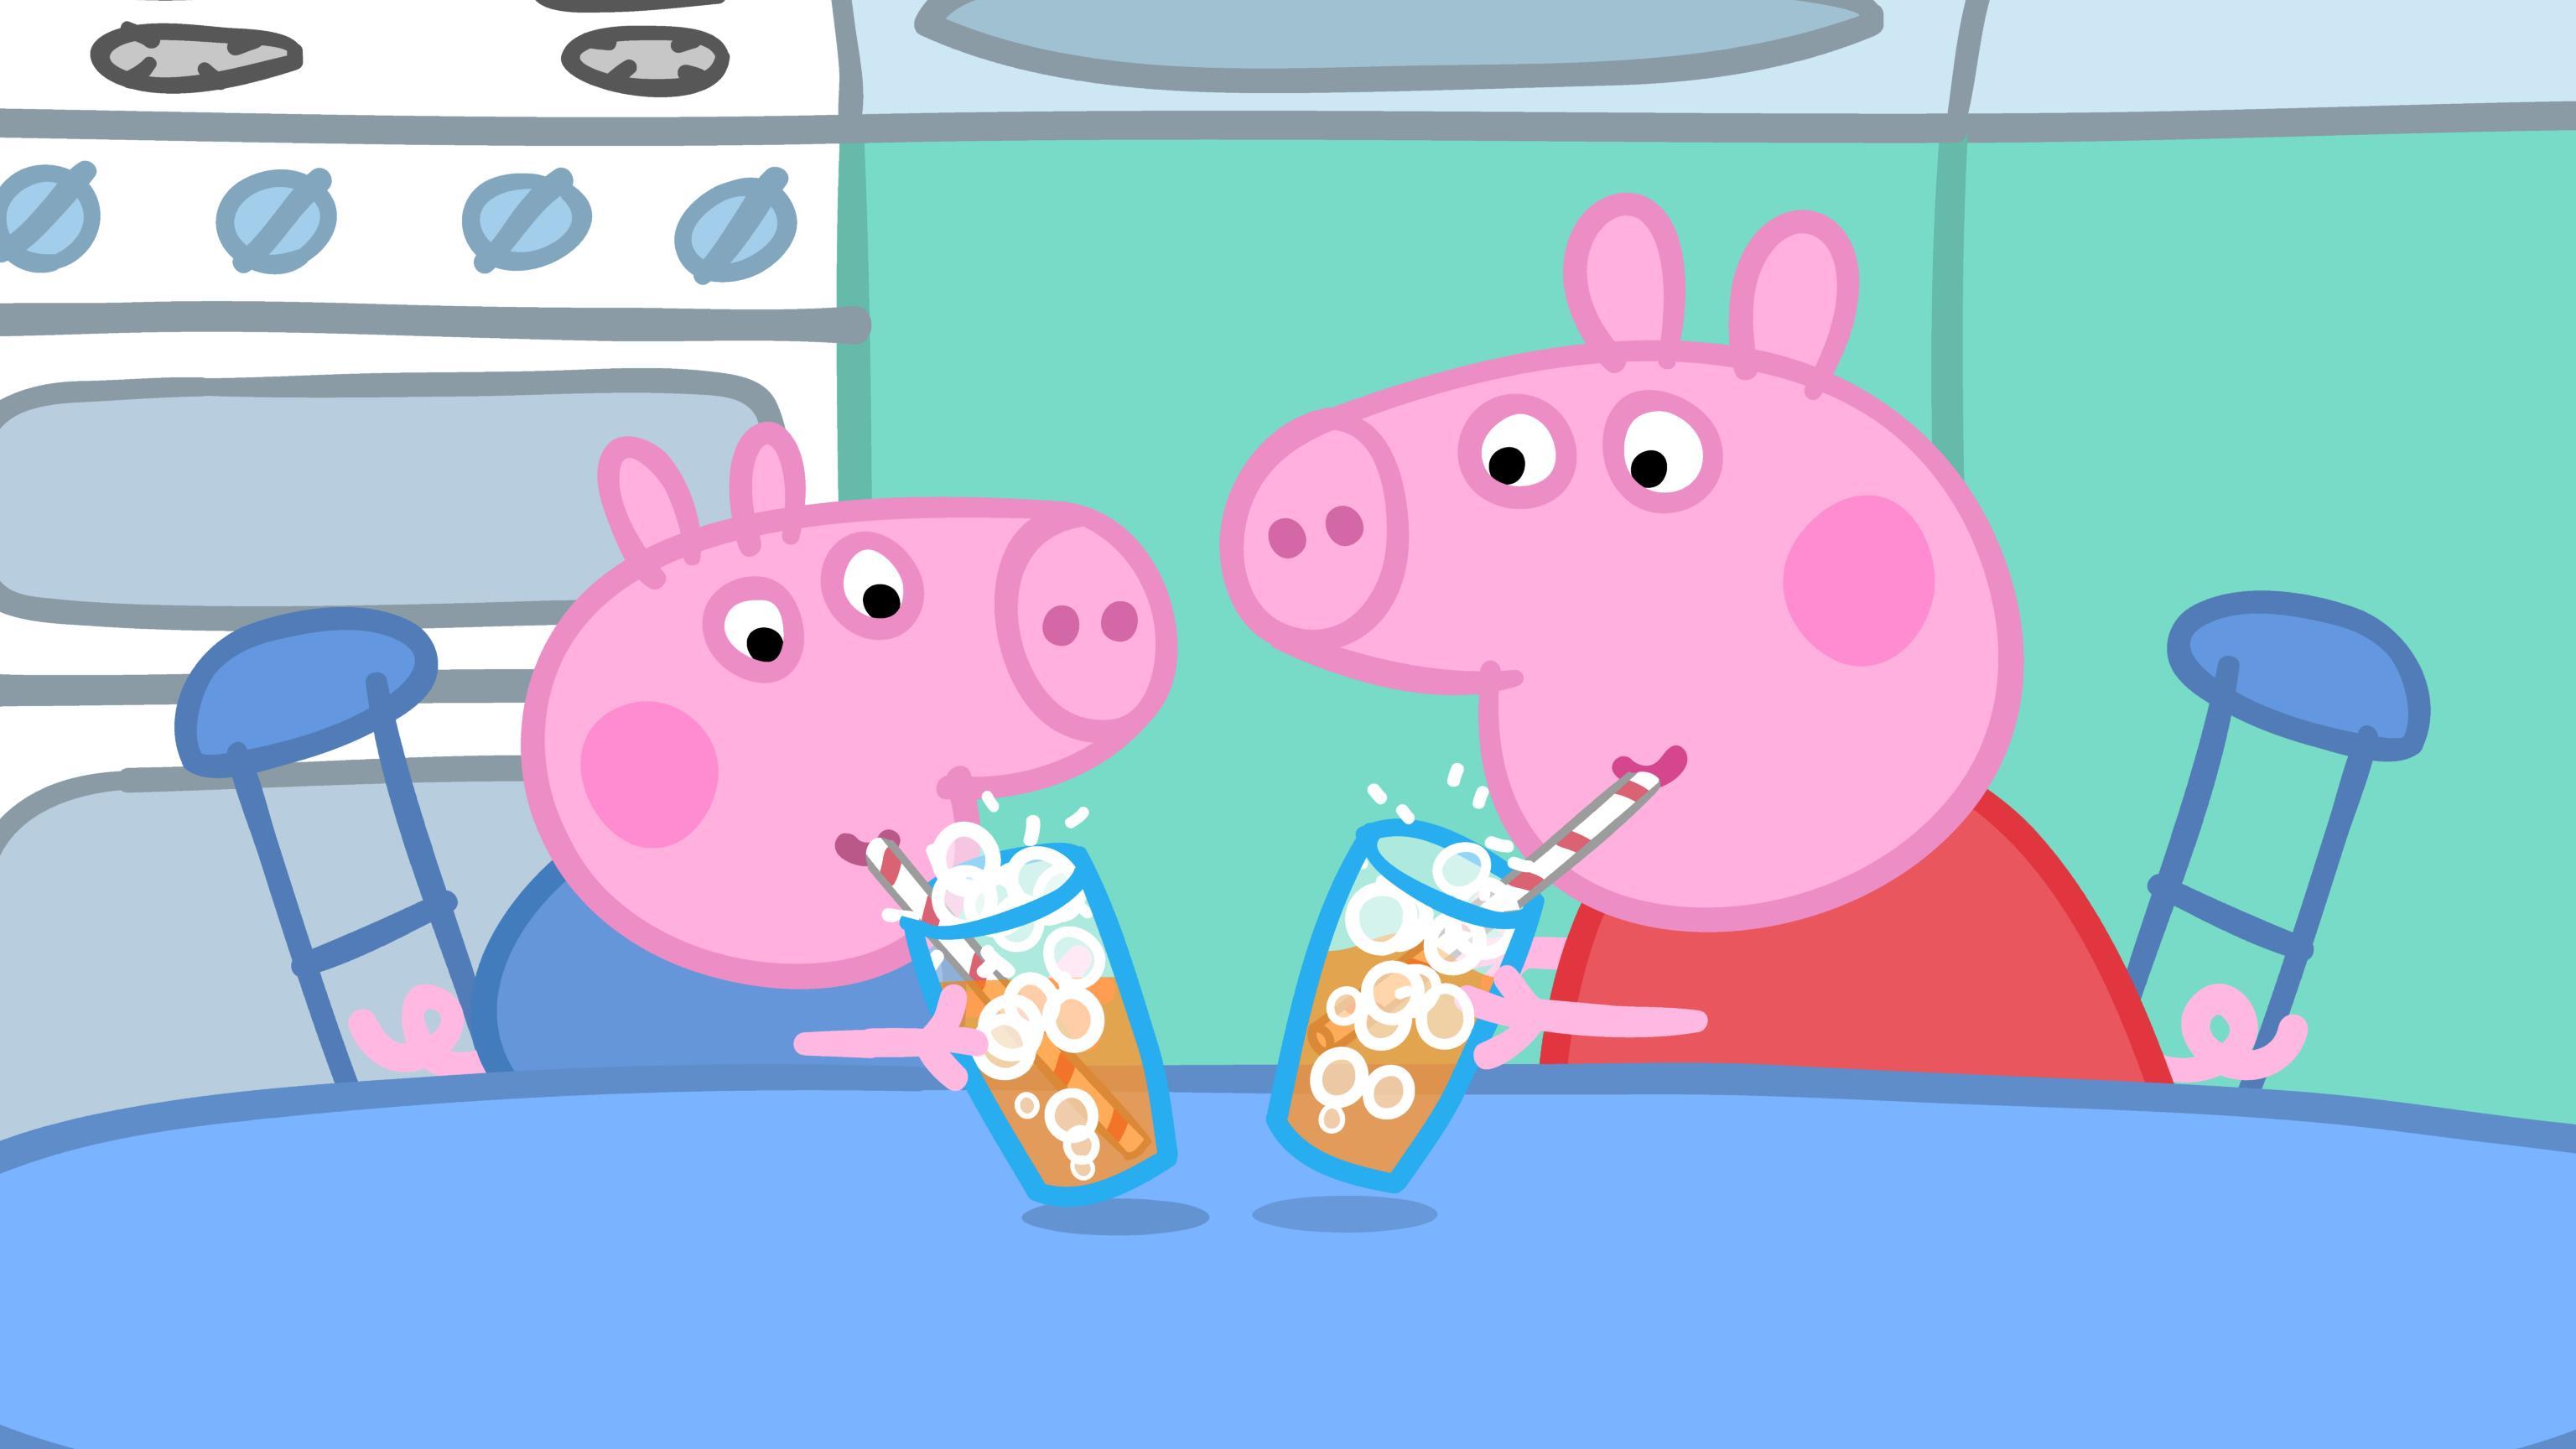 3rd-strike.com | Peppa Pig: Bubbels (DVD) - Series Review